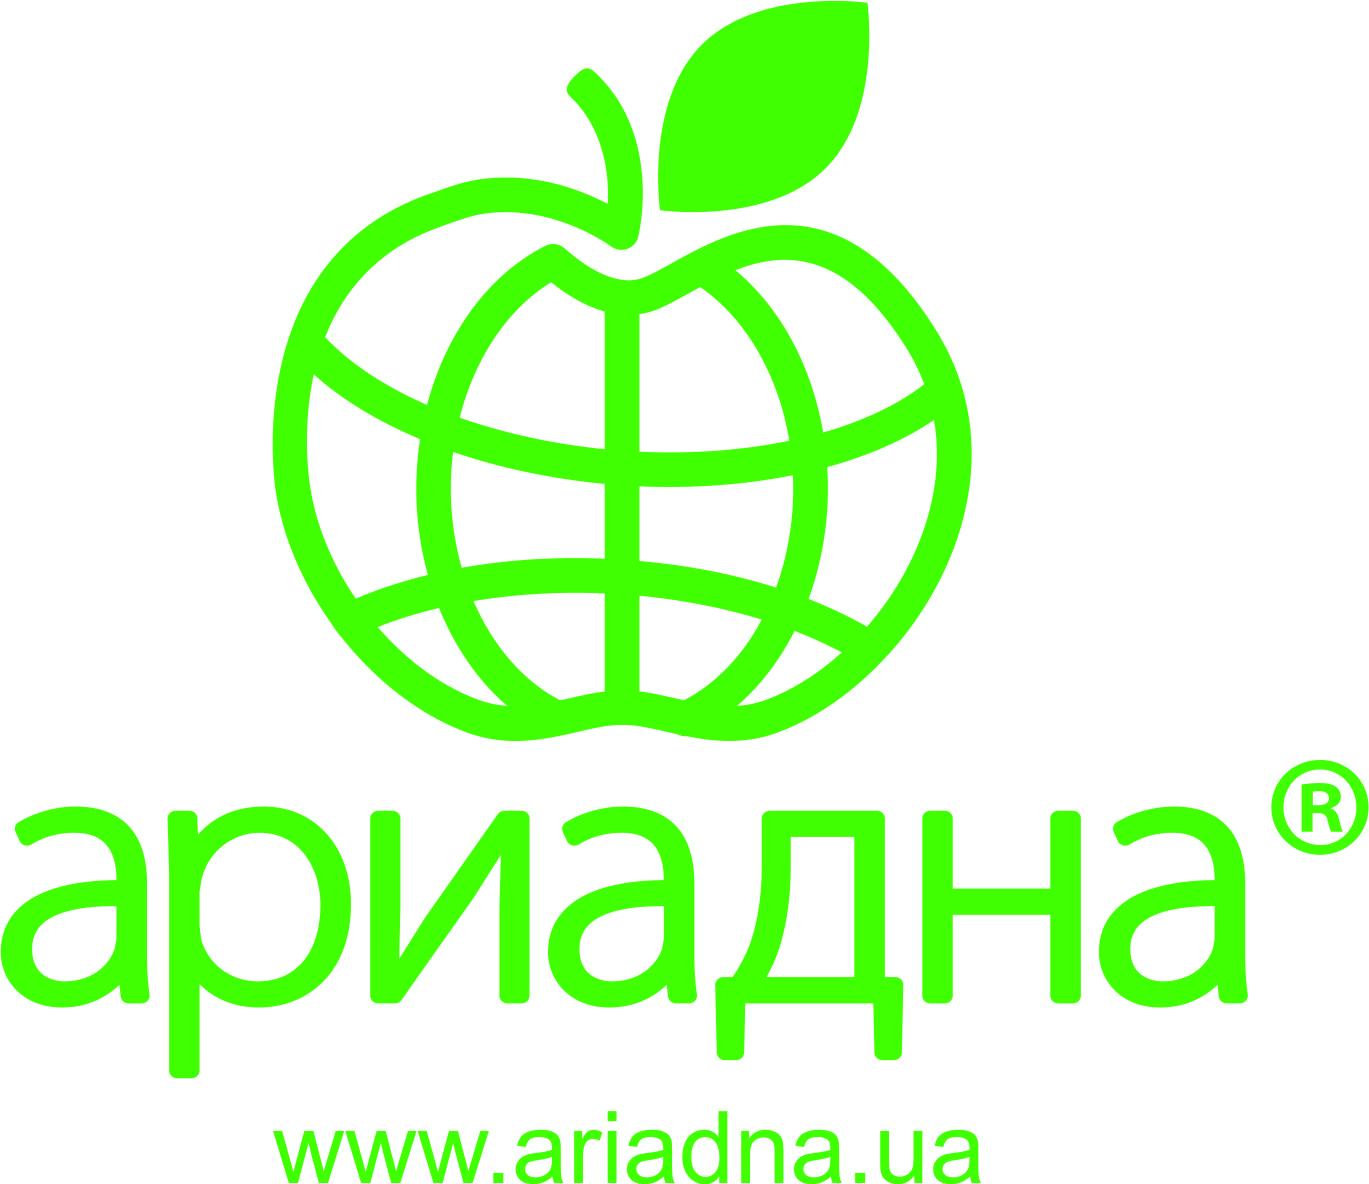 Ариадна, НПП